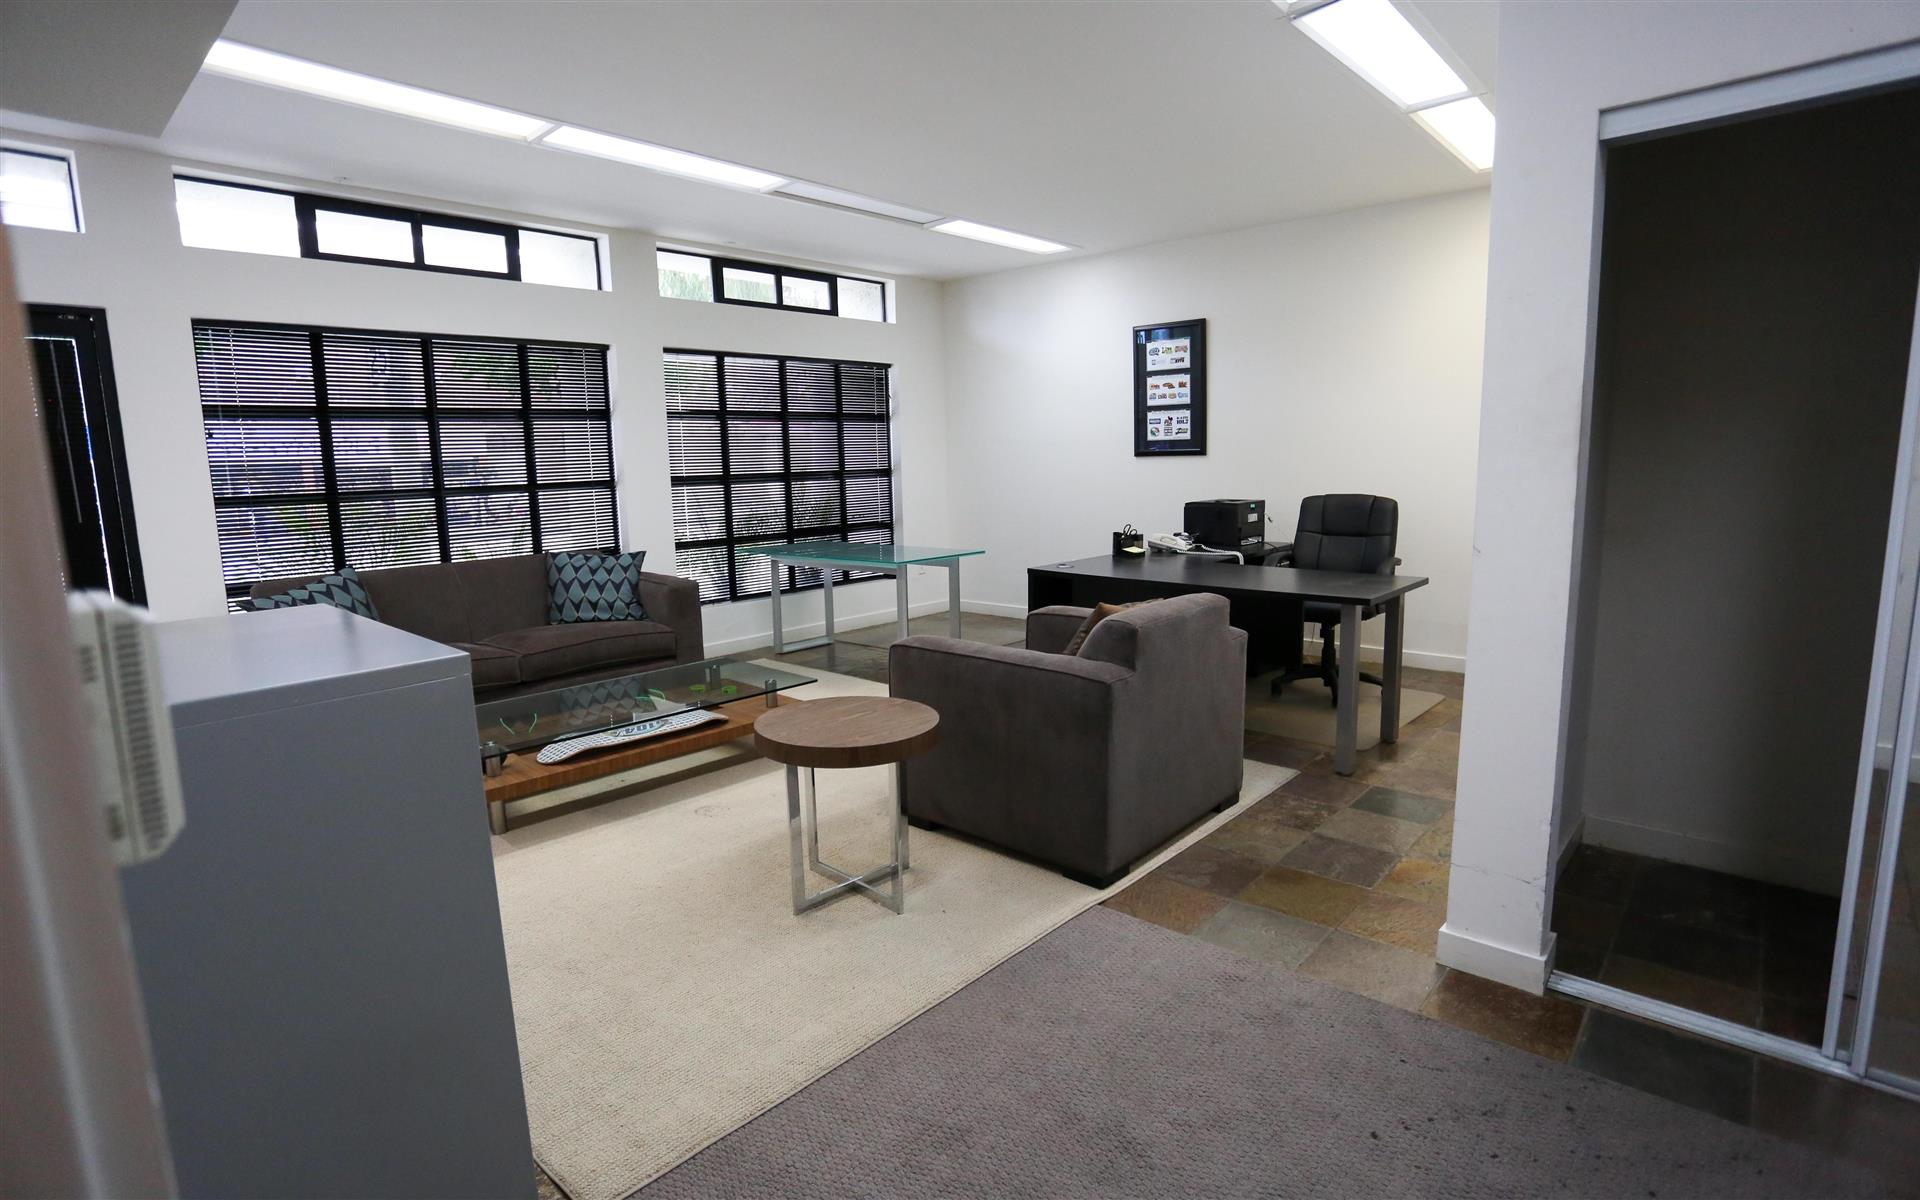 713 Broadway - Office Suite 1